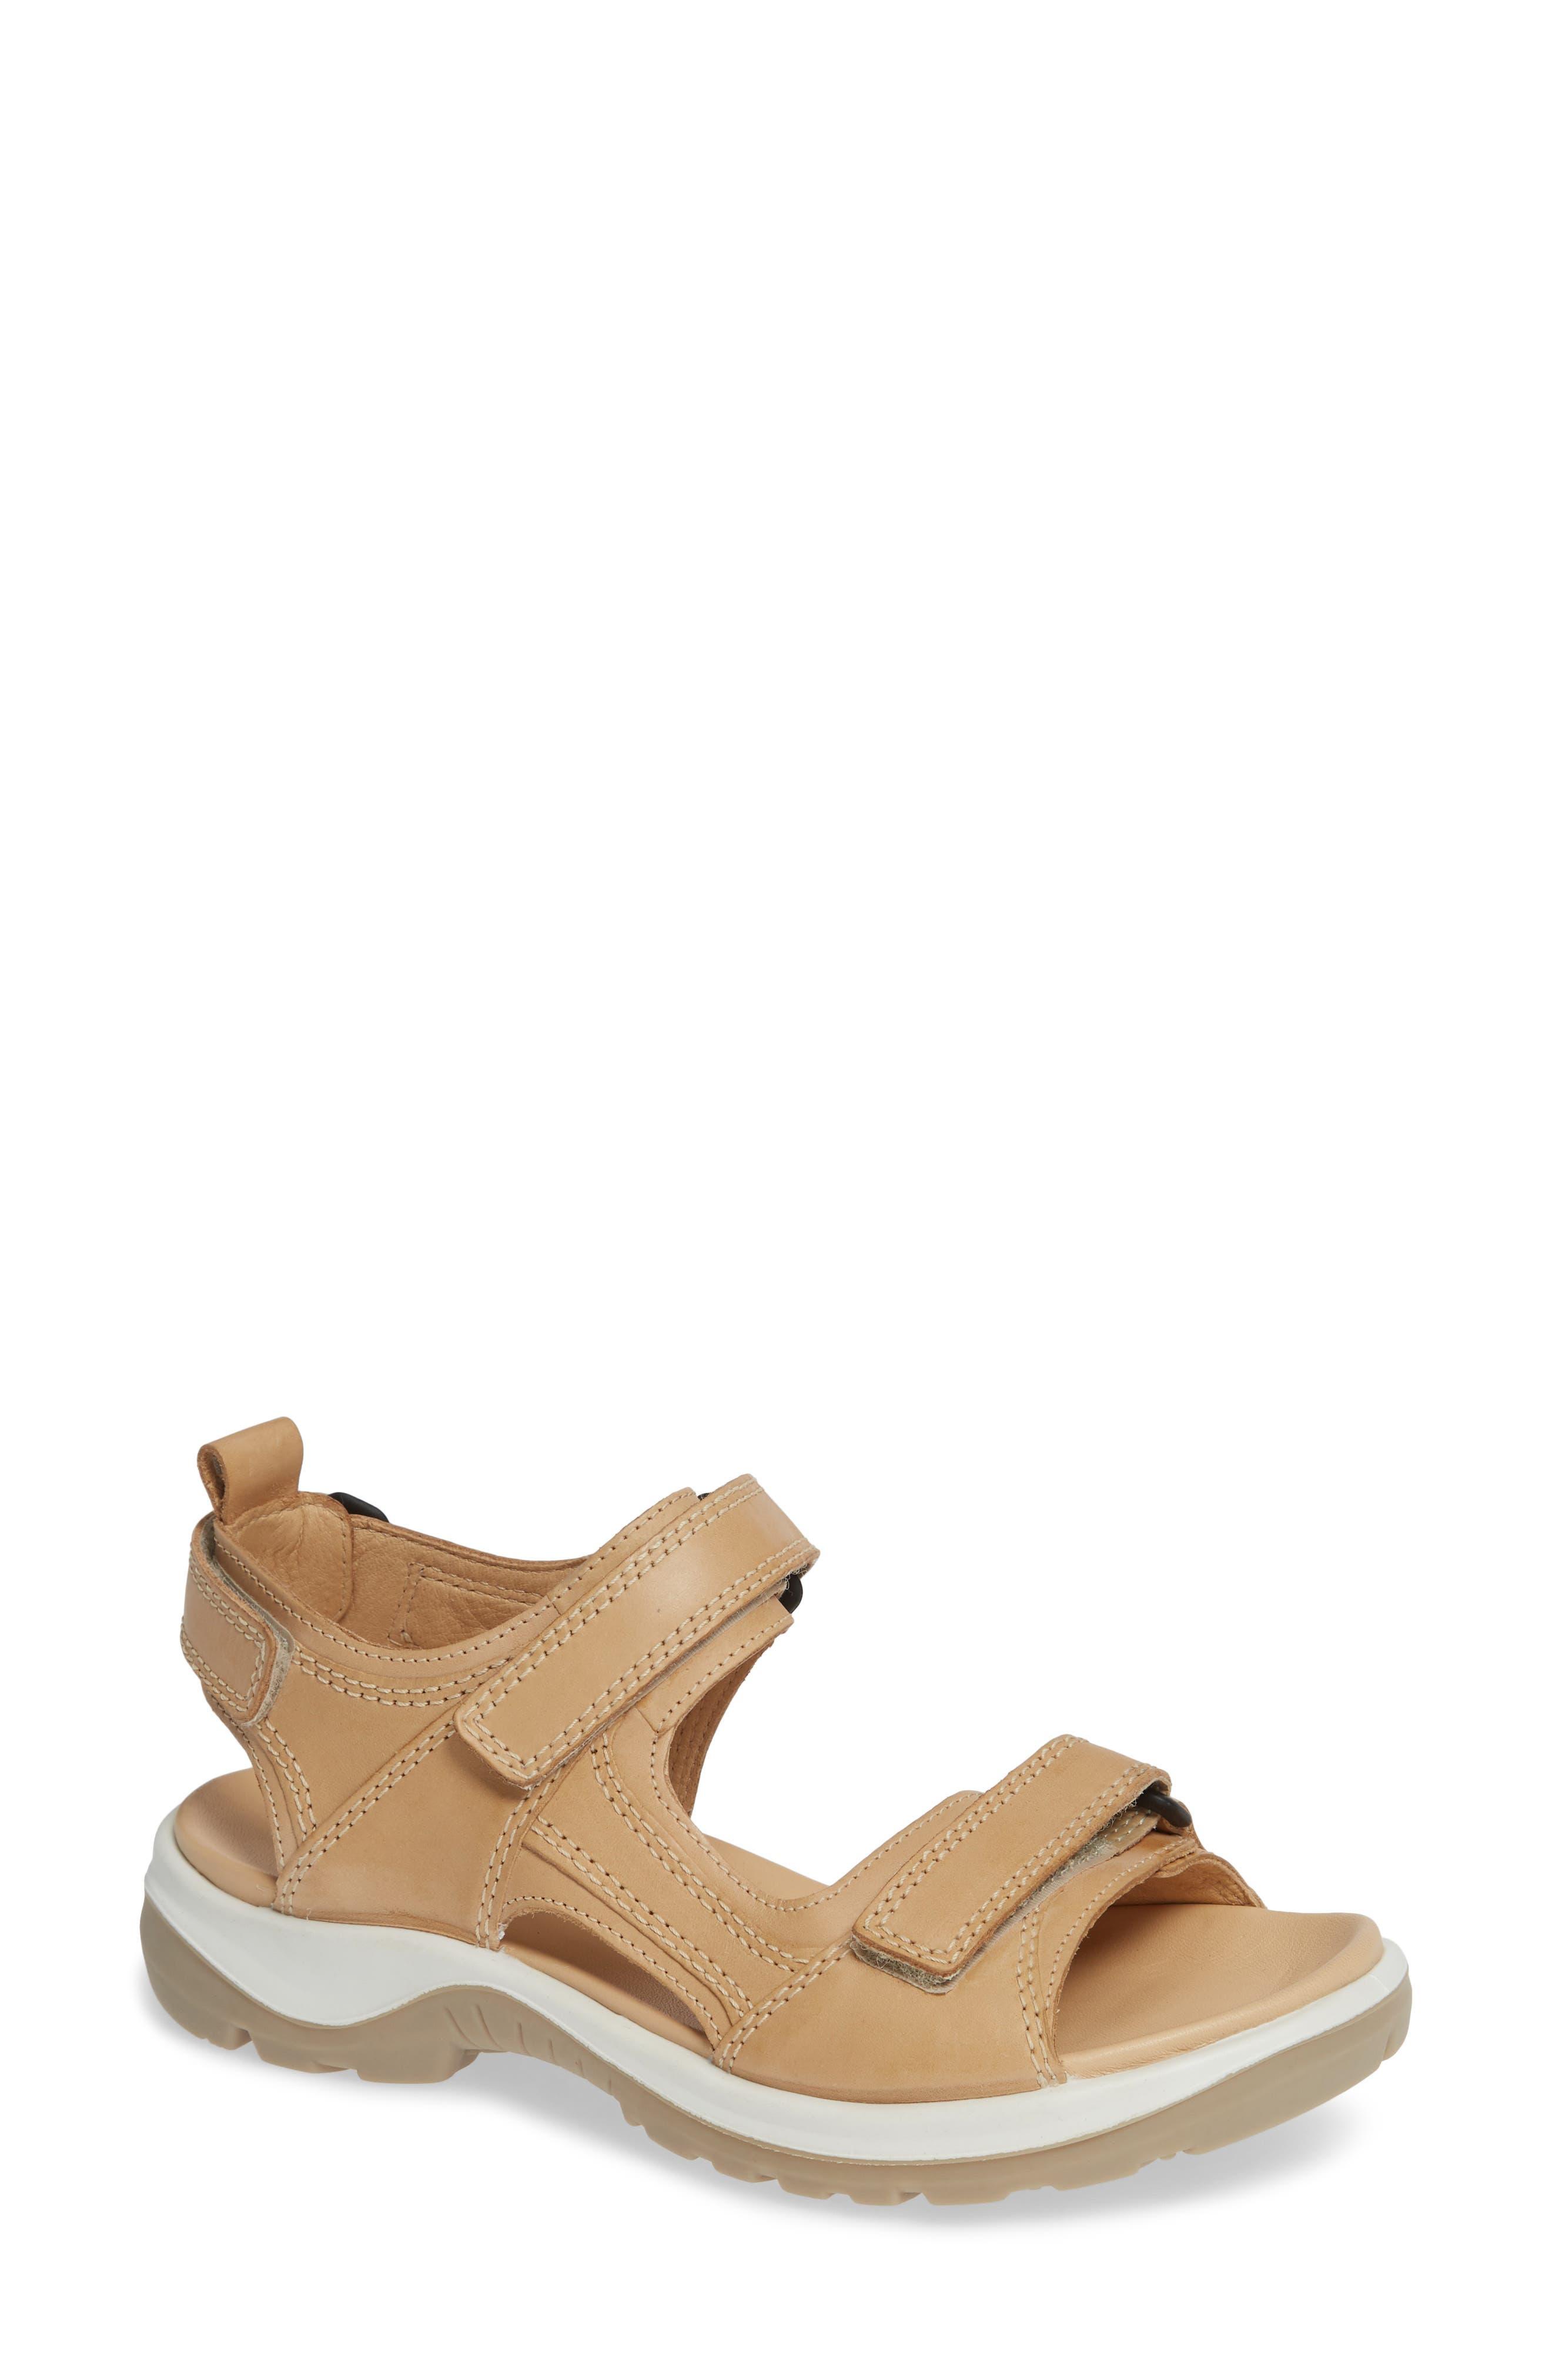 Ecco Premium Offroad Sandal, Beige